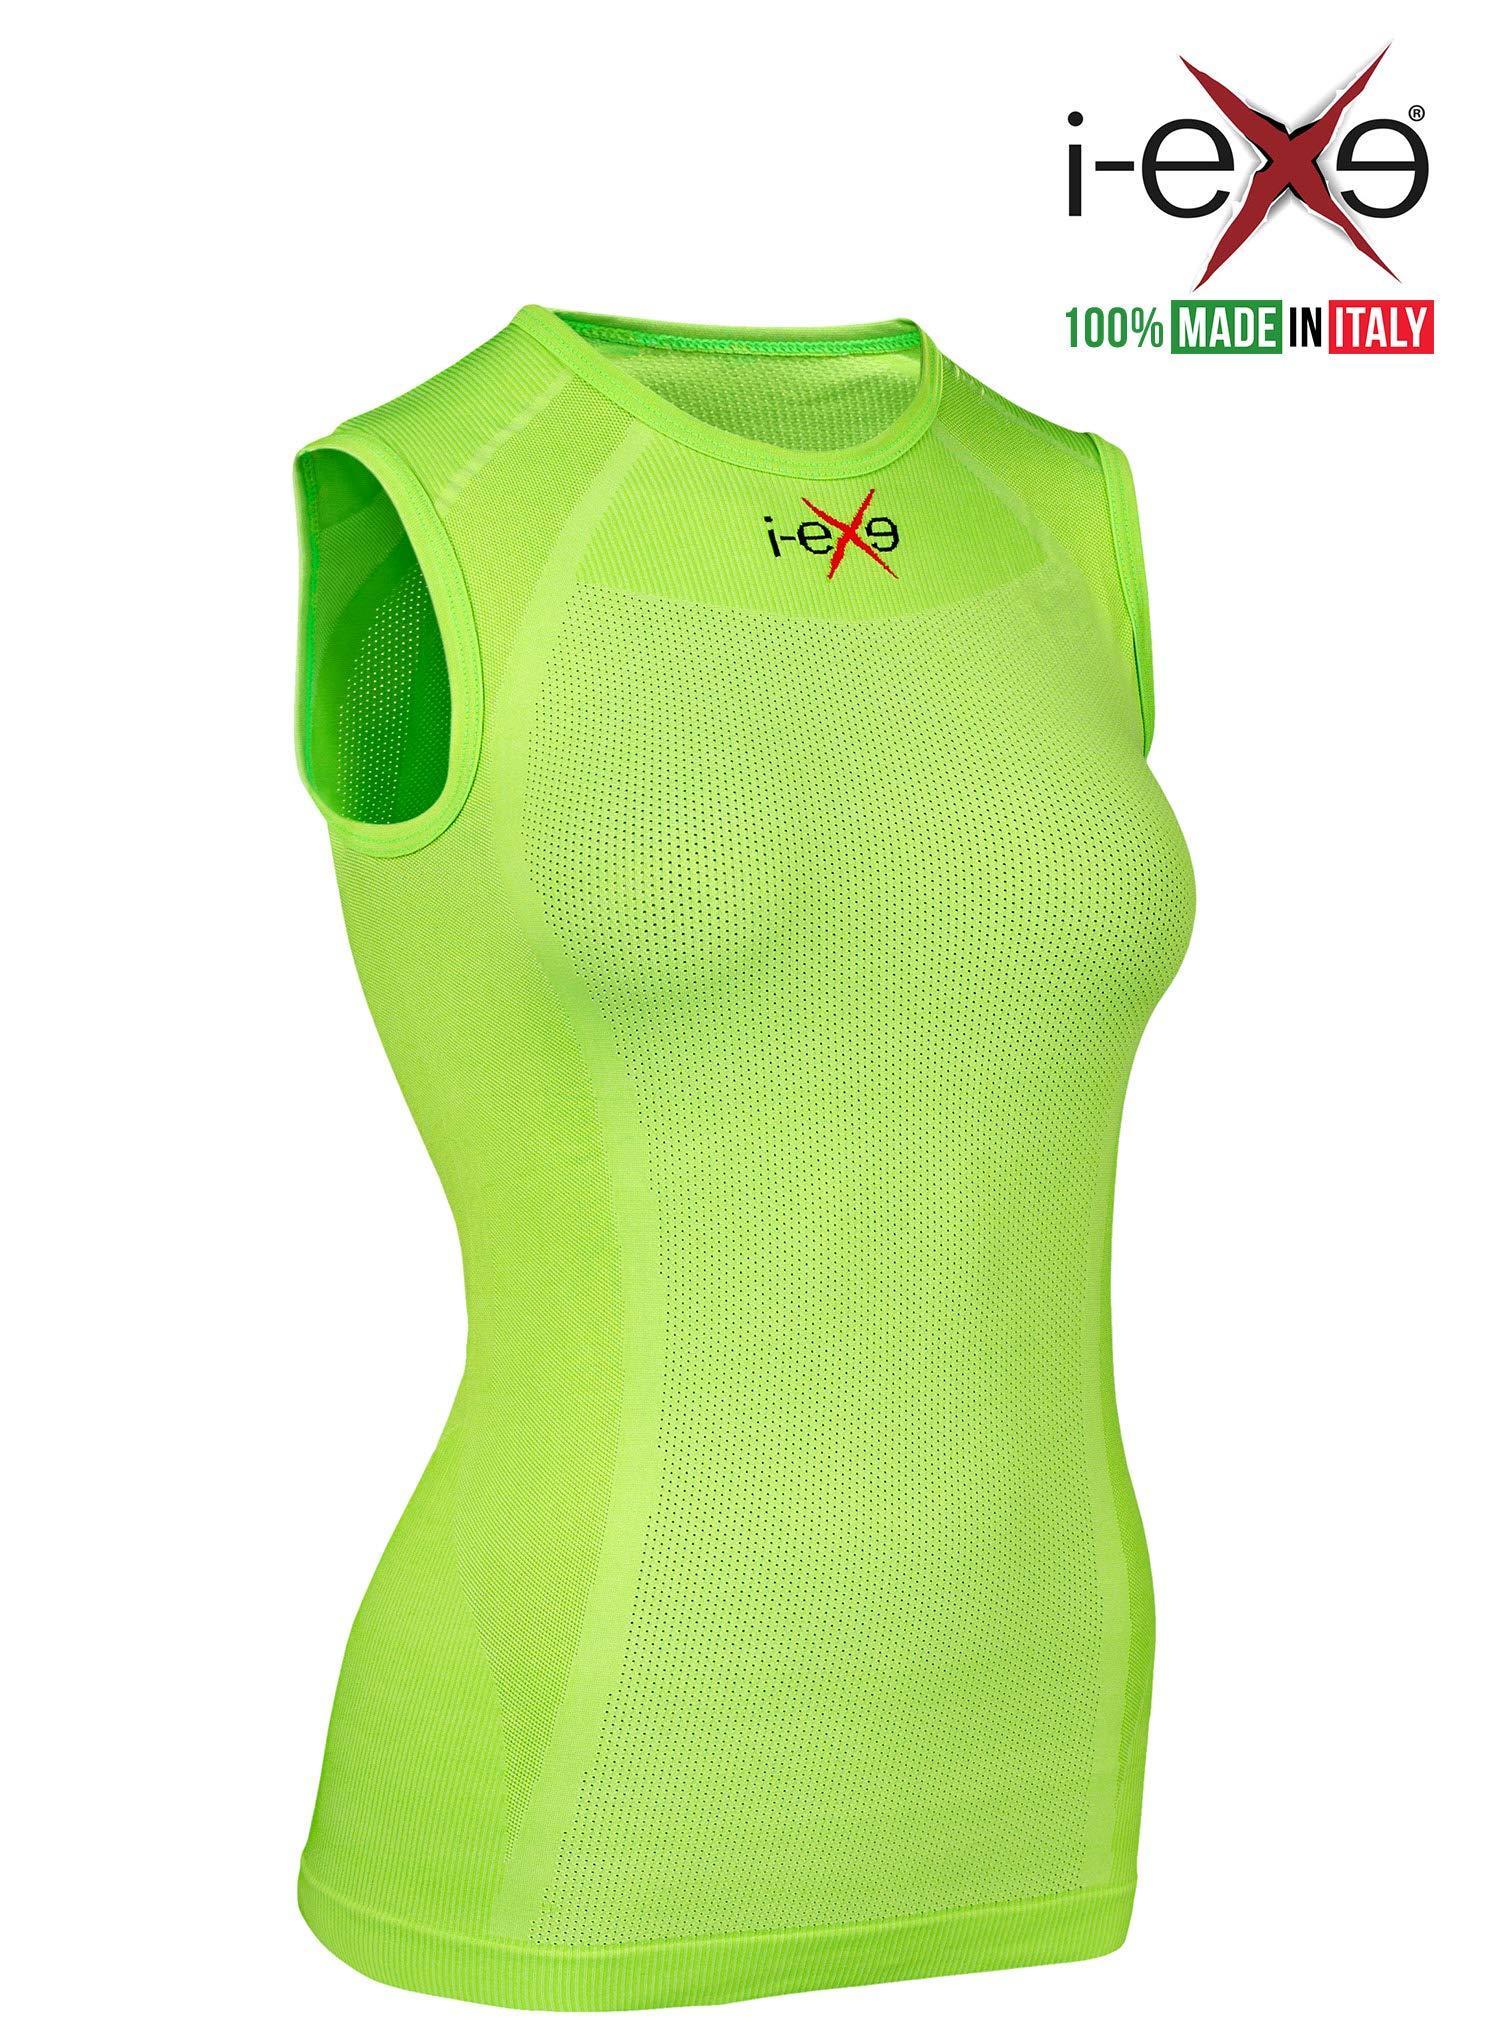 I-EXE Womens Compr Shirt CLR: Green, SZ: S to M